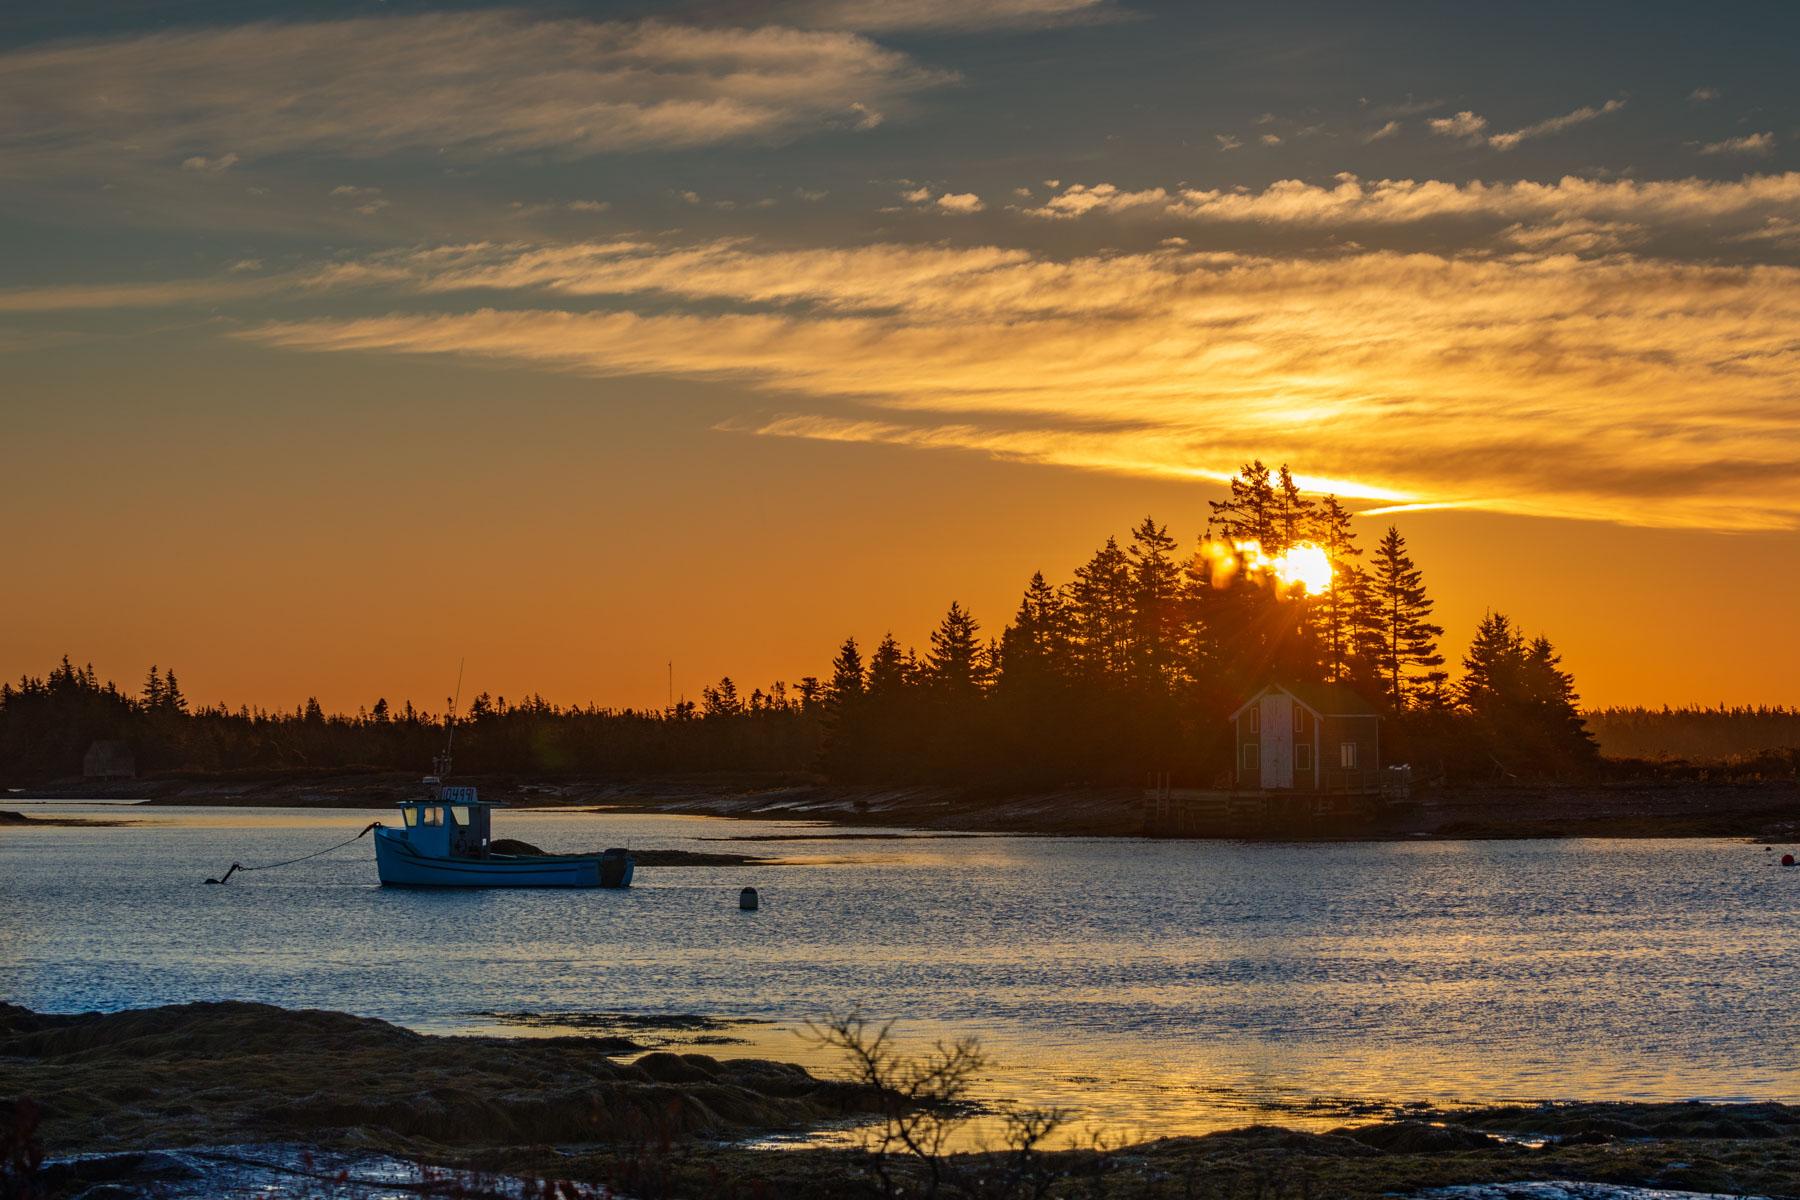 Blue Rocks sun and sunrise, Lunenburg, Nova Scotia, Canada